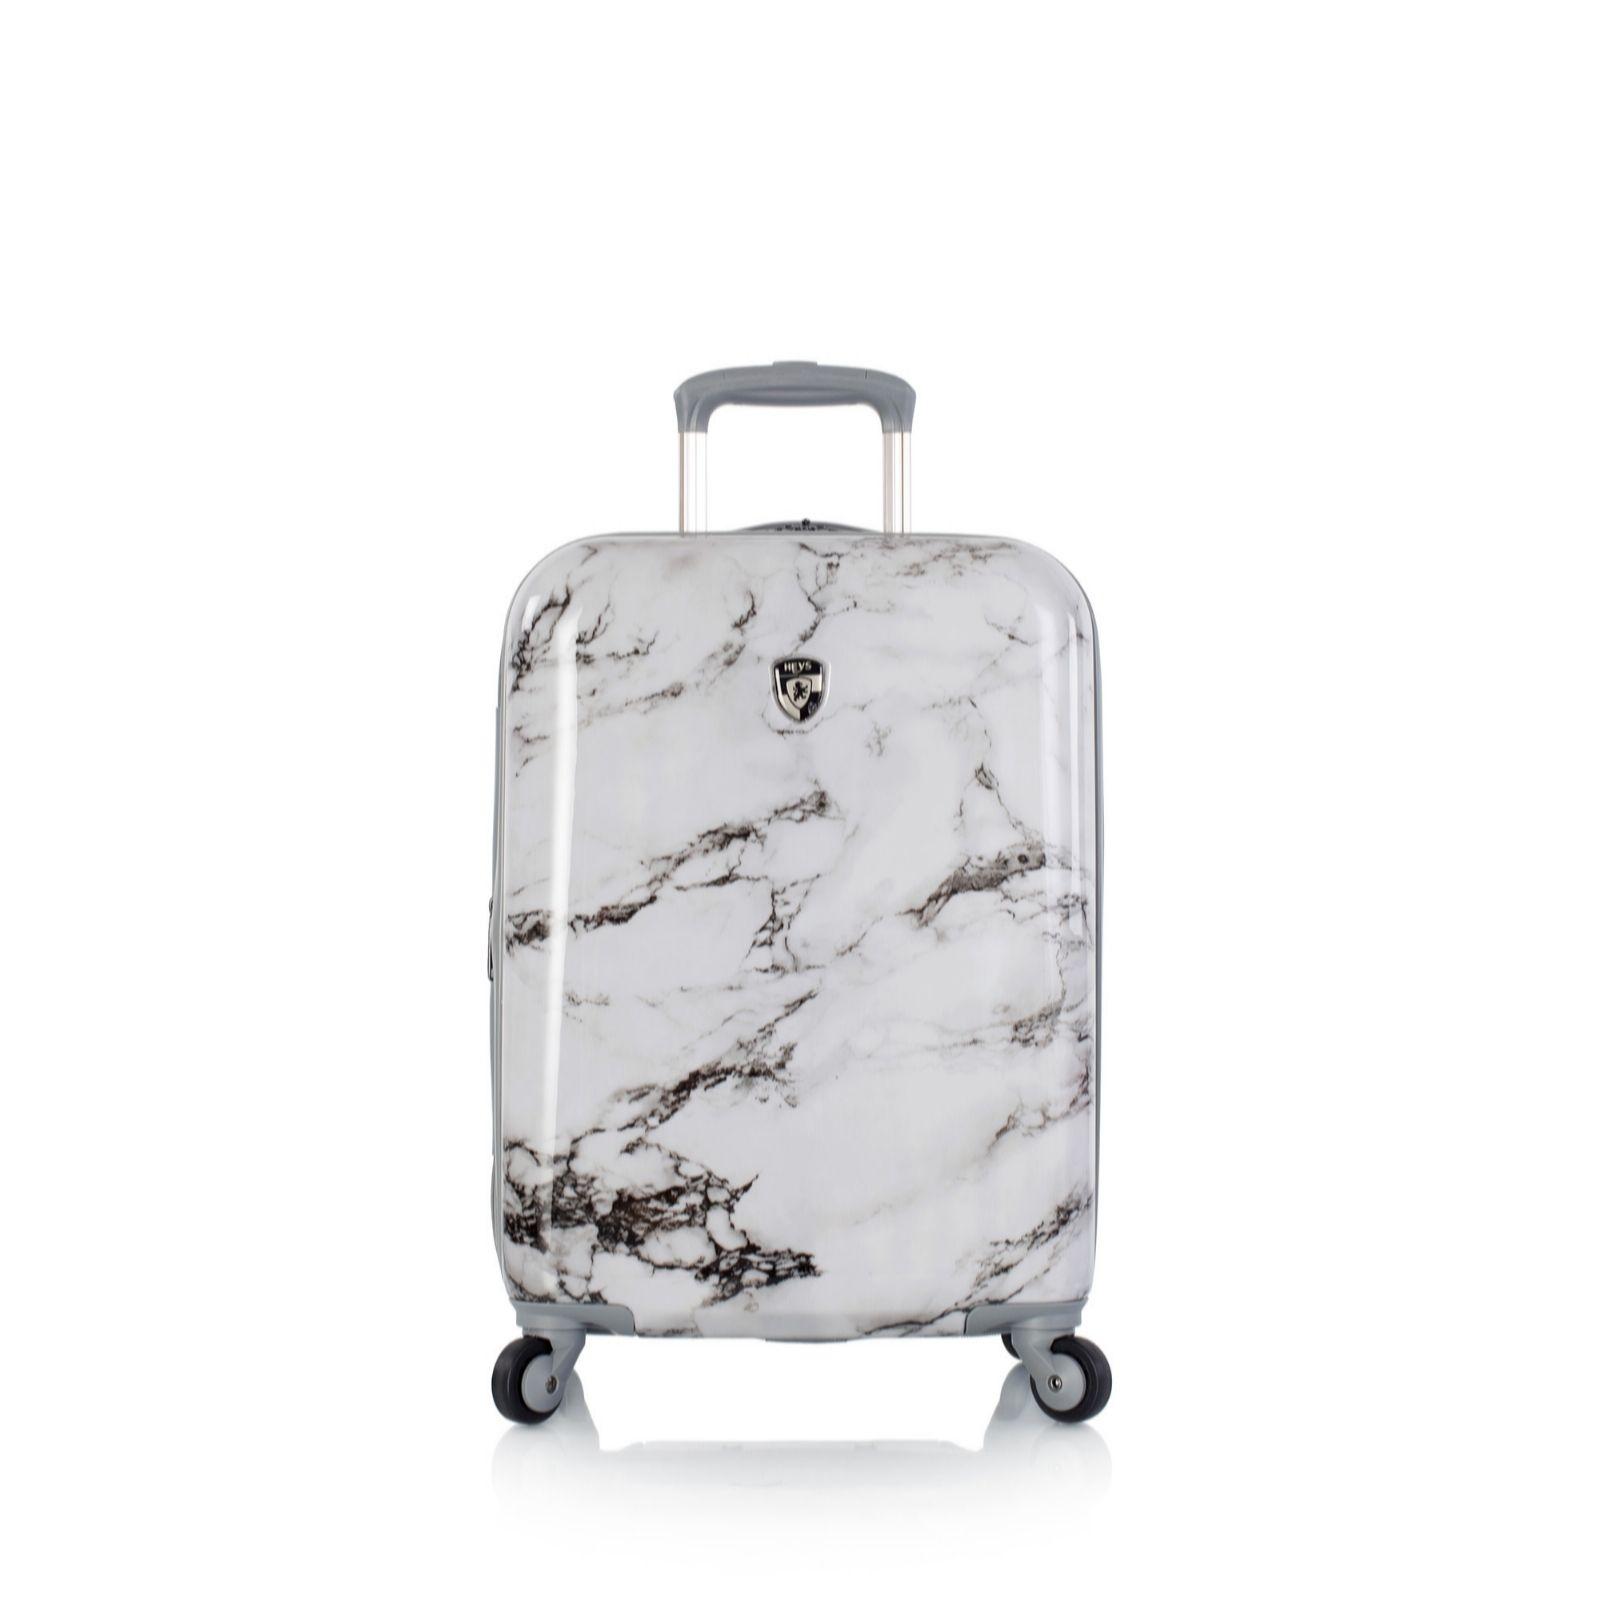 Heys Marble Cabin Suitcase Qvc Uk